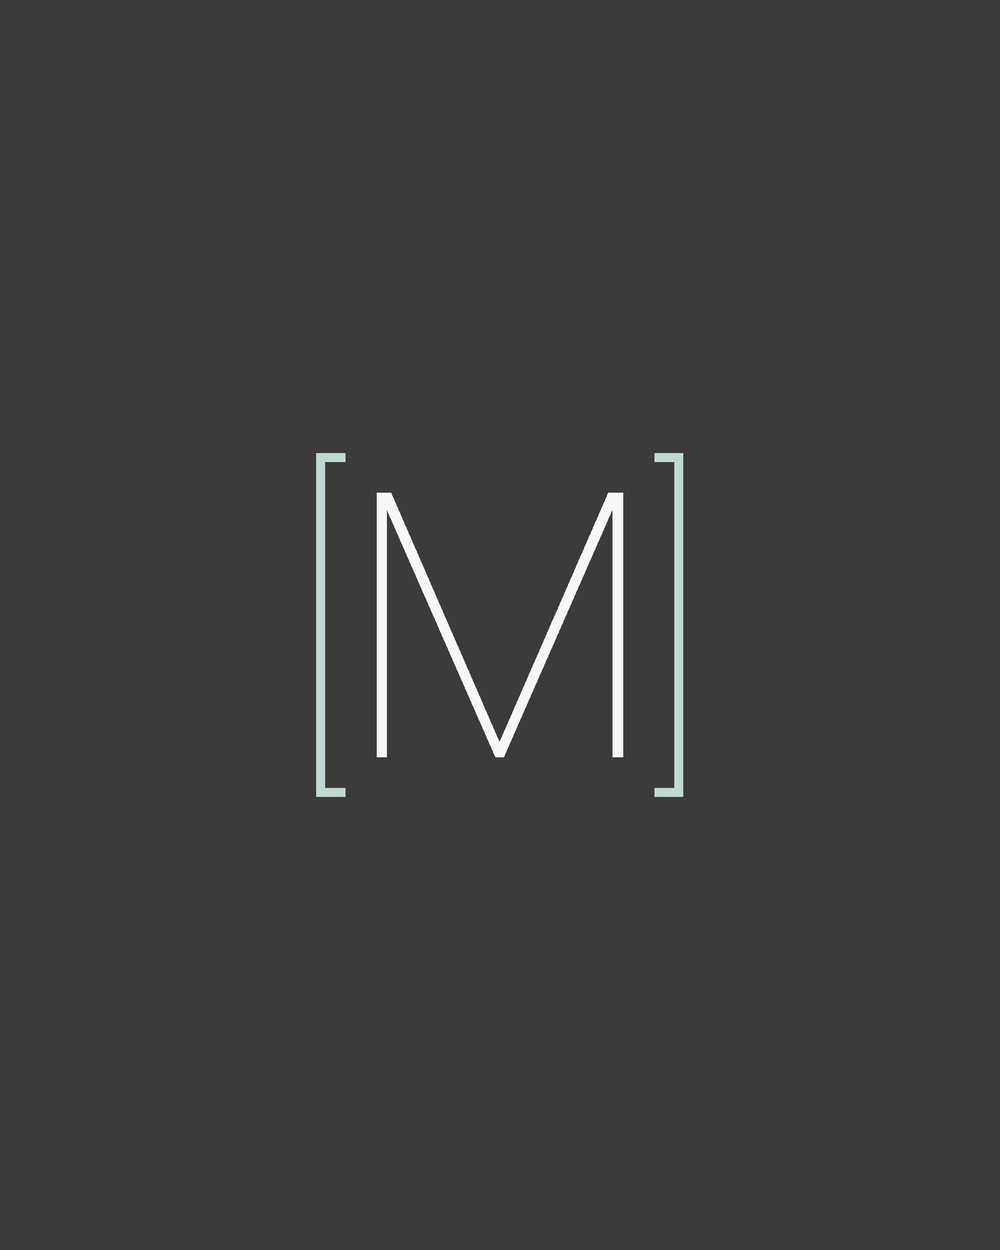 mintcollection-travel-branding-graphicdesign-iowa-worldwide-hospitatlity8.png